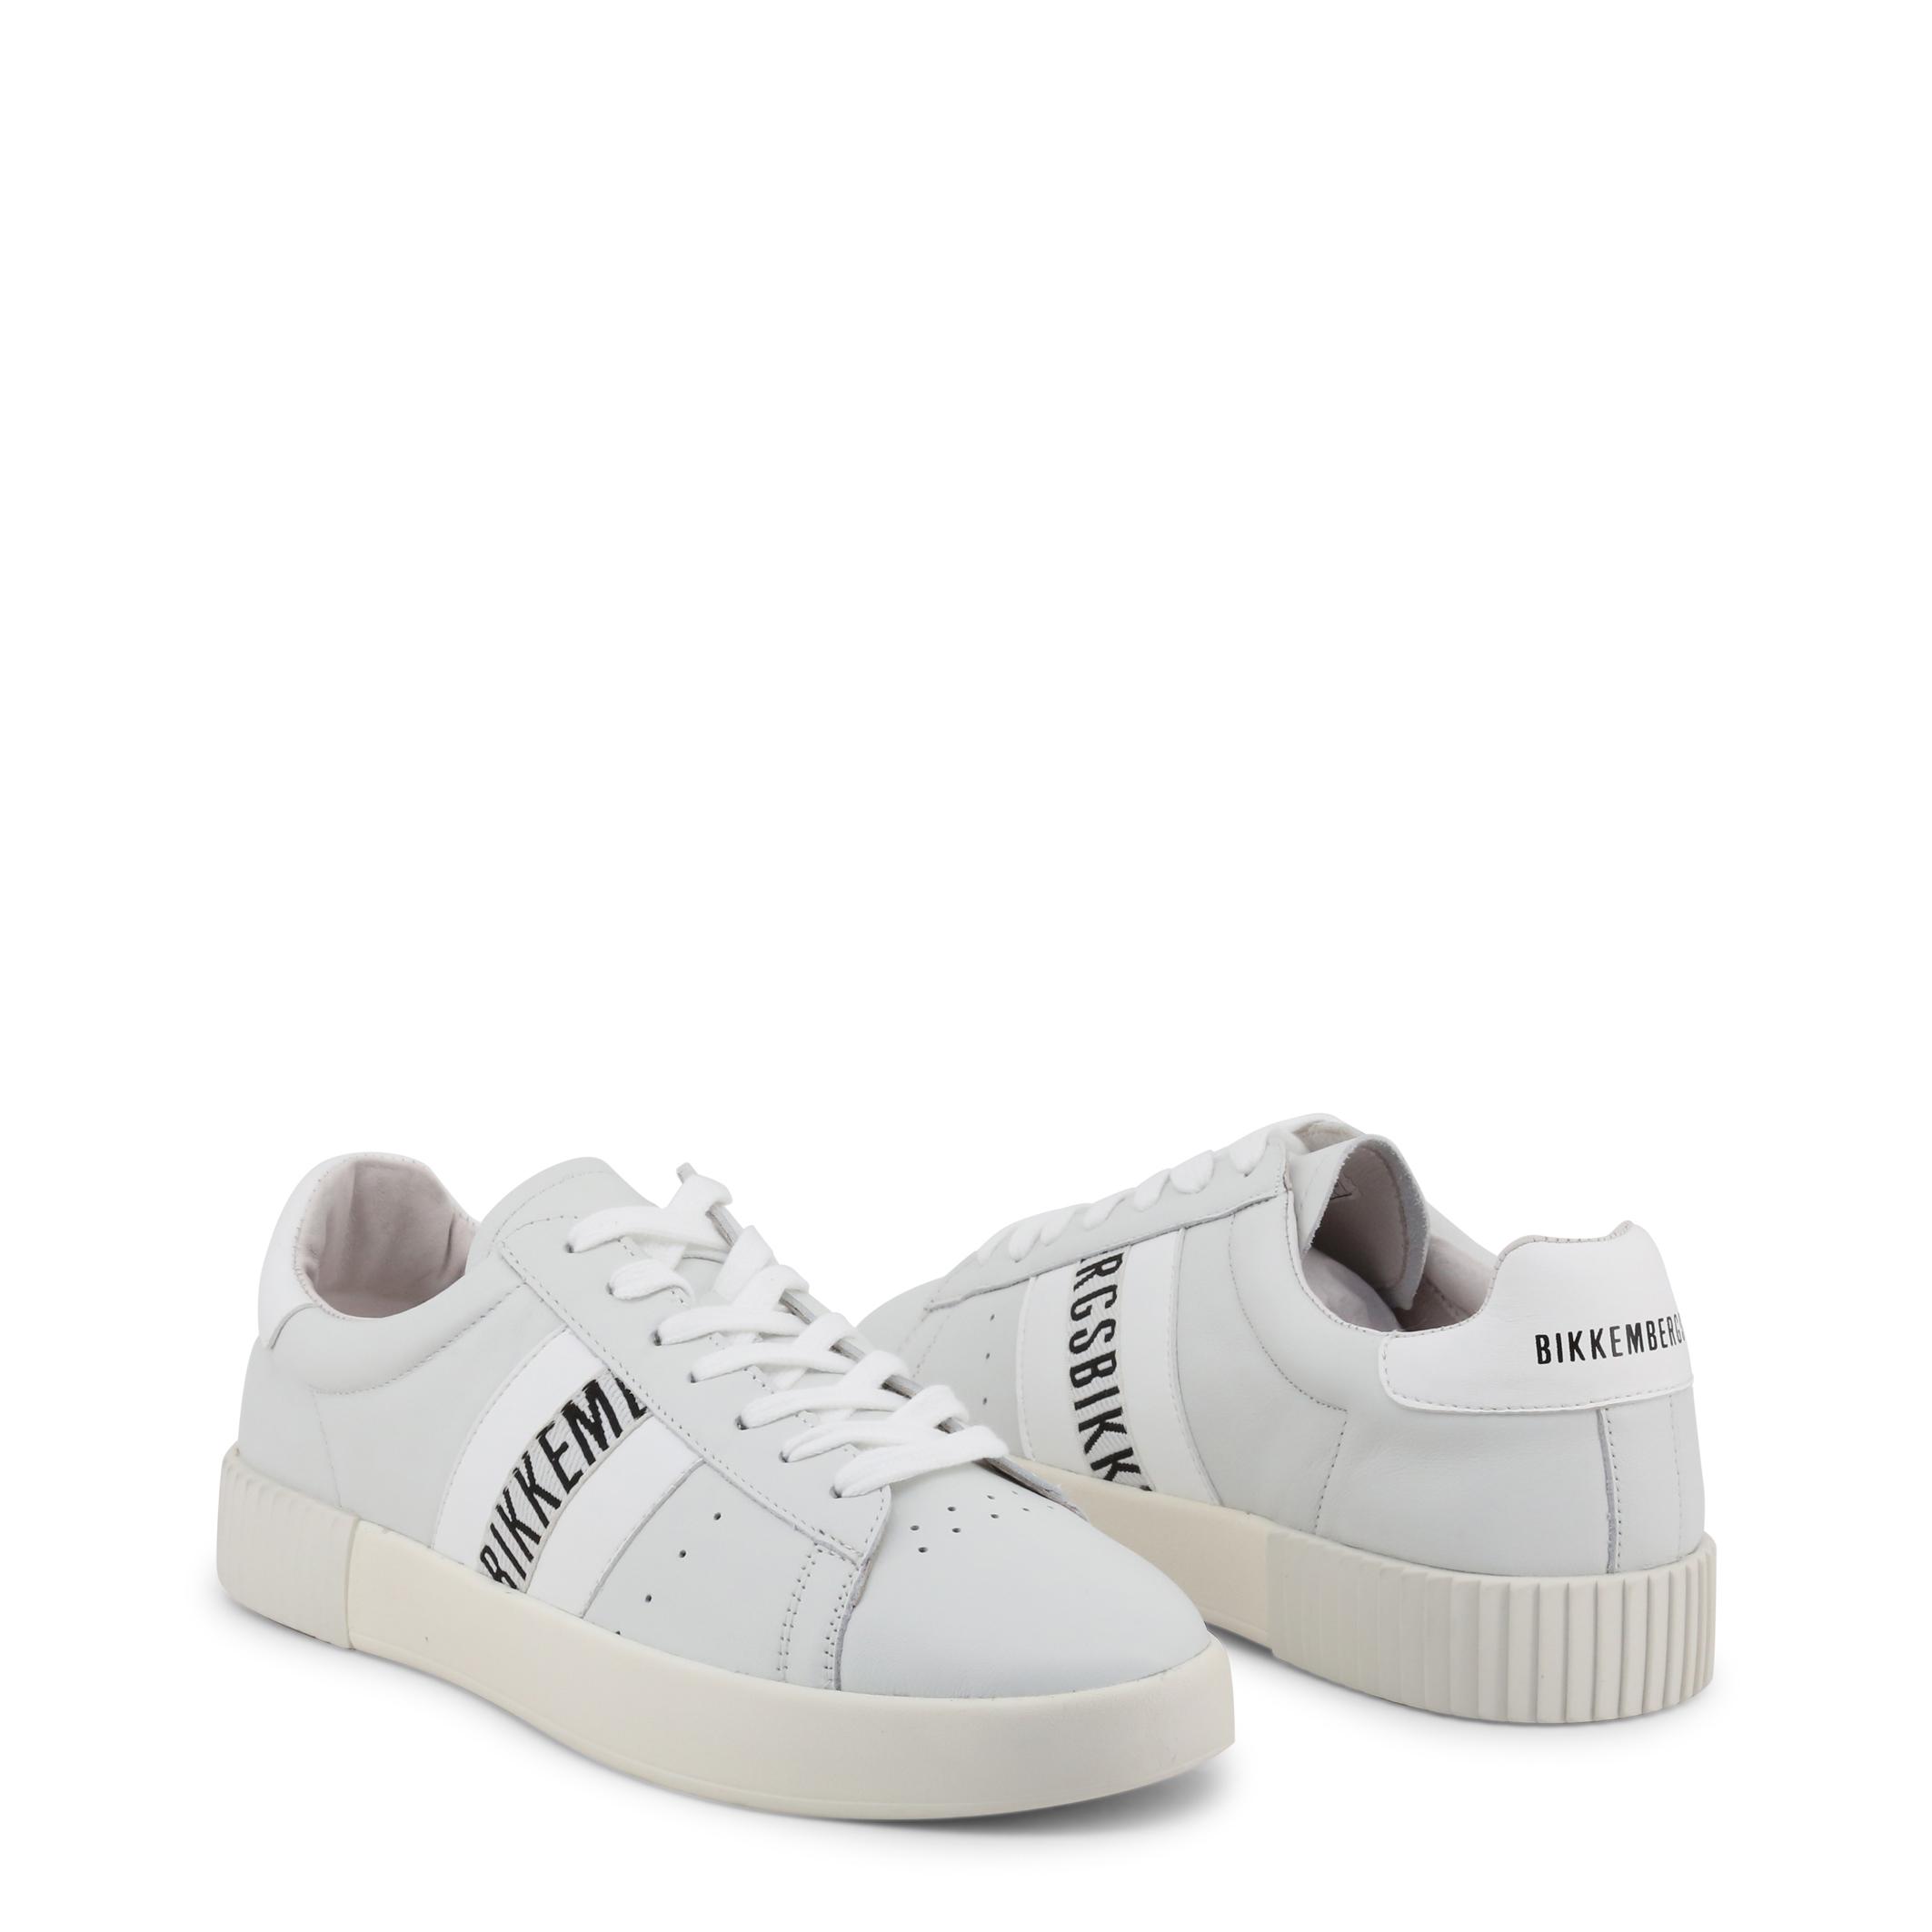 Sneakers-Bikkembergs-COSMOS-2434-Uomo-Bianco-98819 miniatura 2